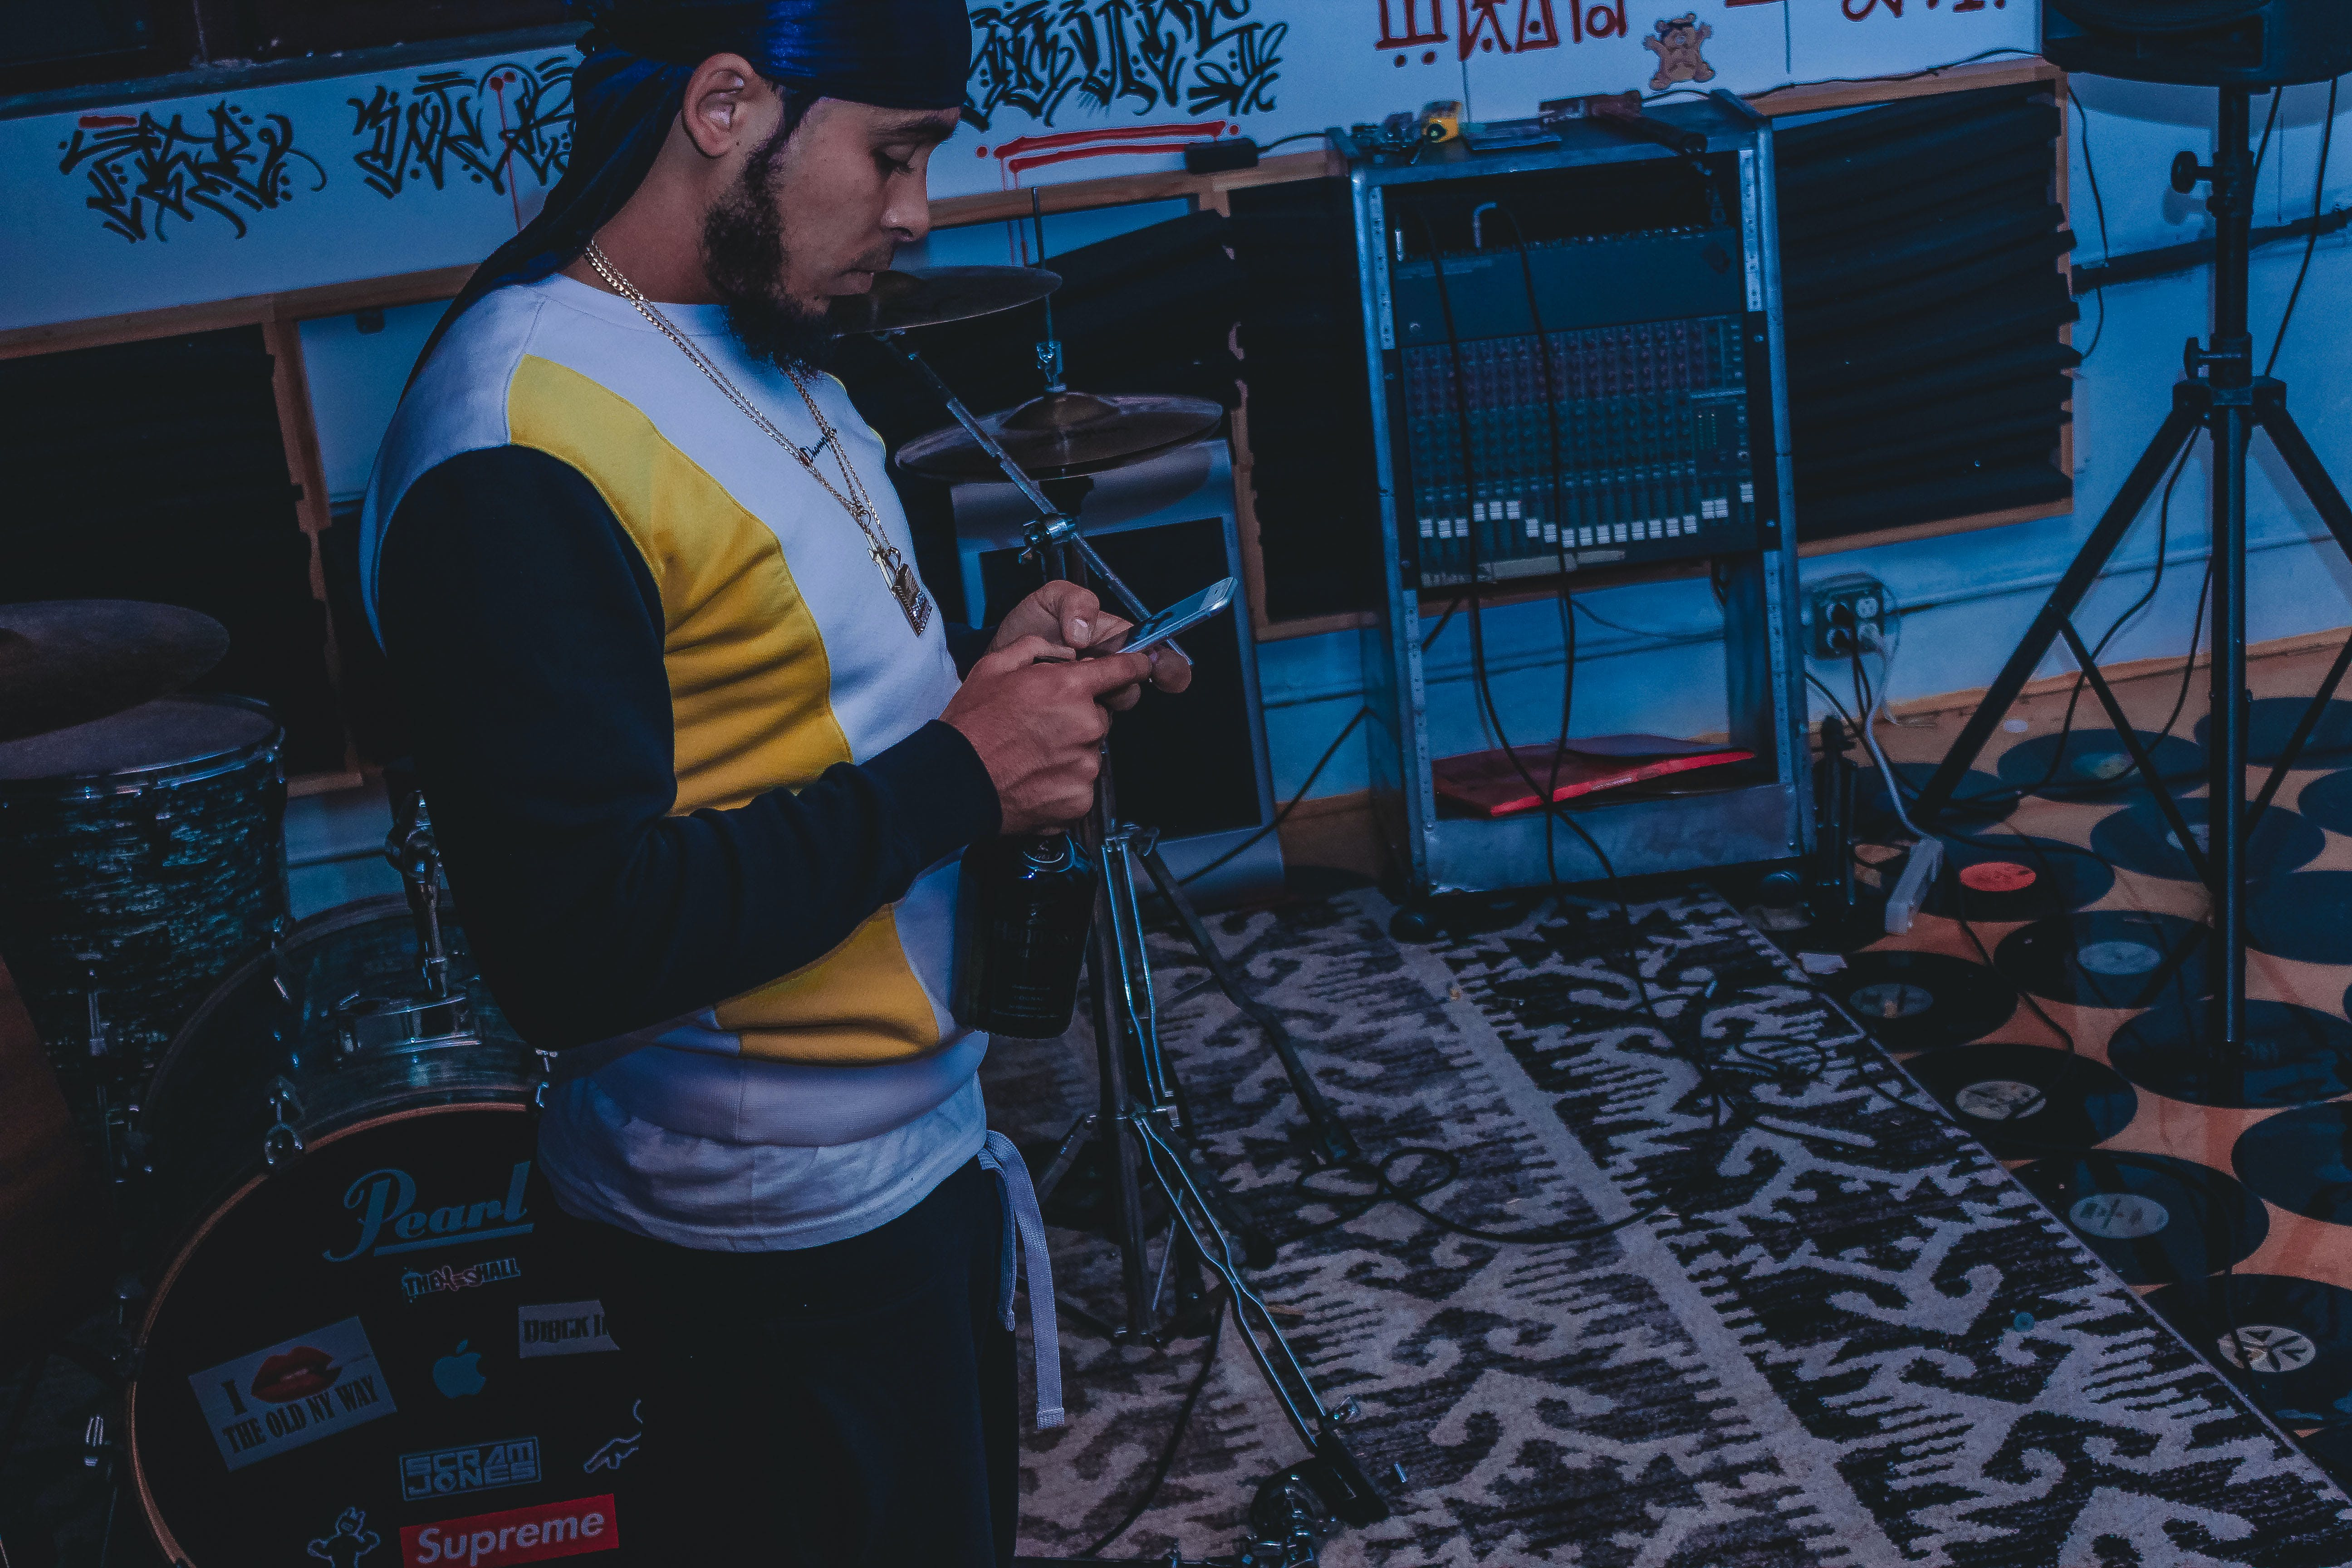 Man Standing Beside Black Pearl Drum Holding Smartphone